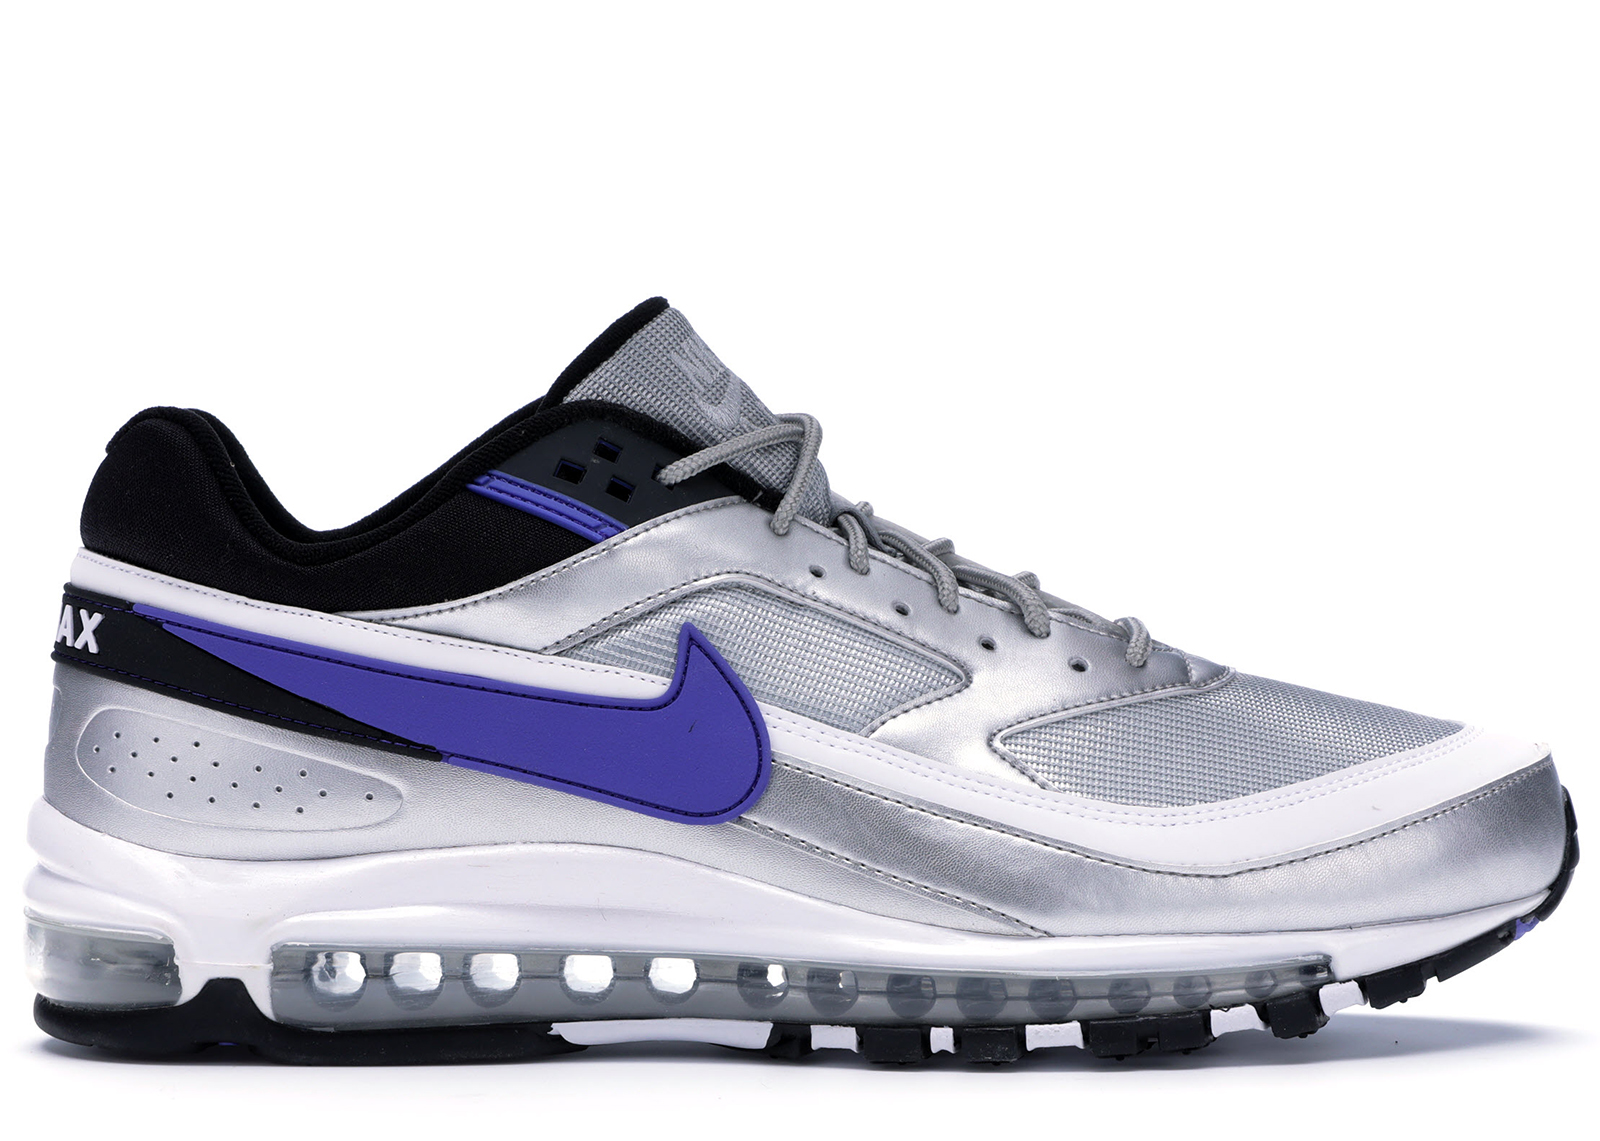 Nike Air Max 97/BW Metallic Silver Persian Violet - AO2406-002